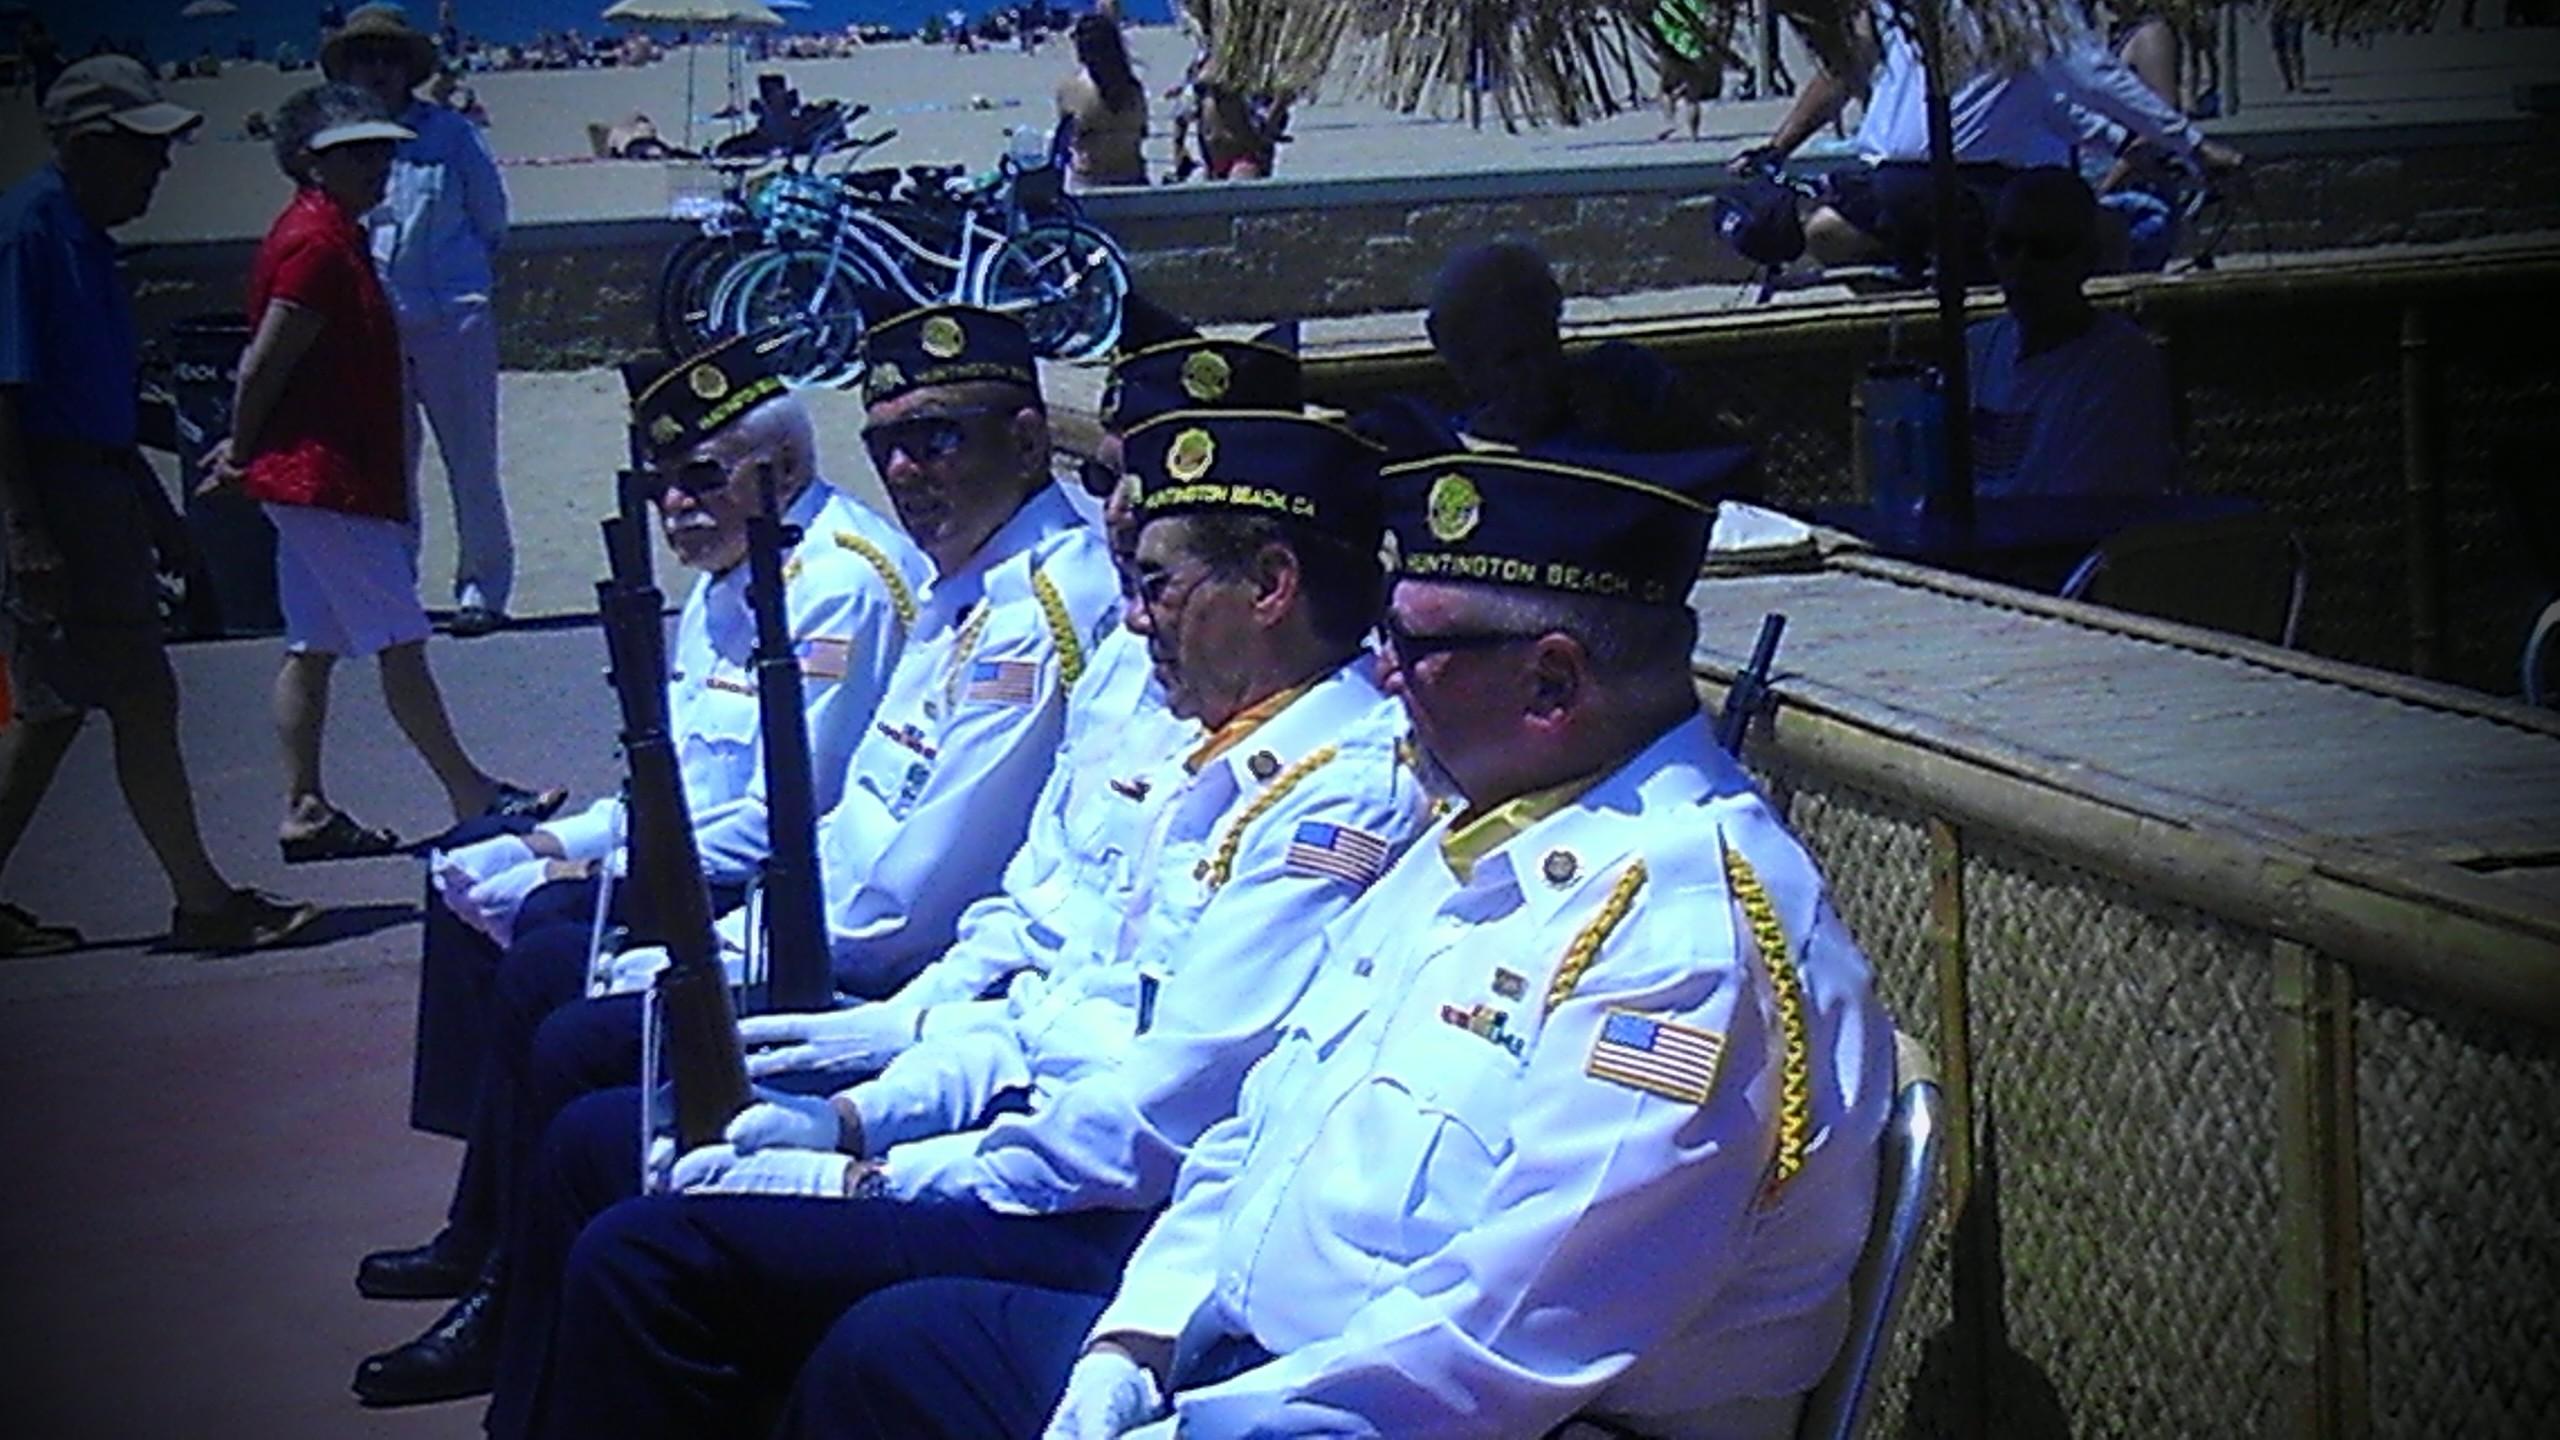 Huntington Beach Veterans Day Pics